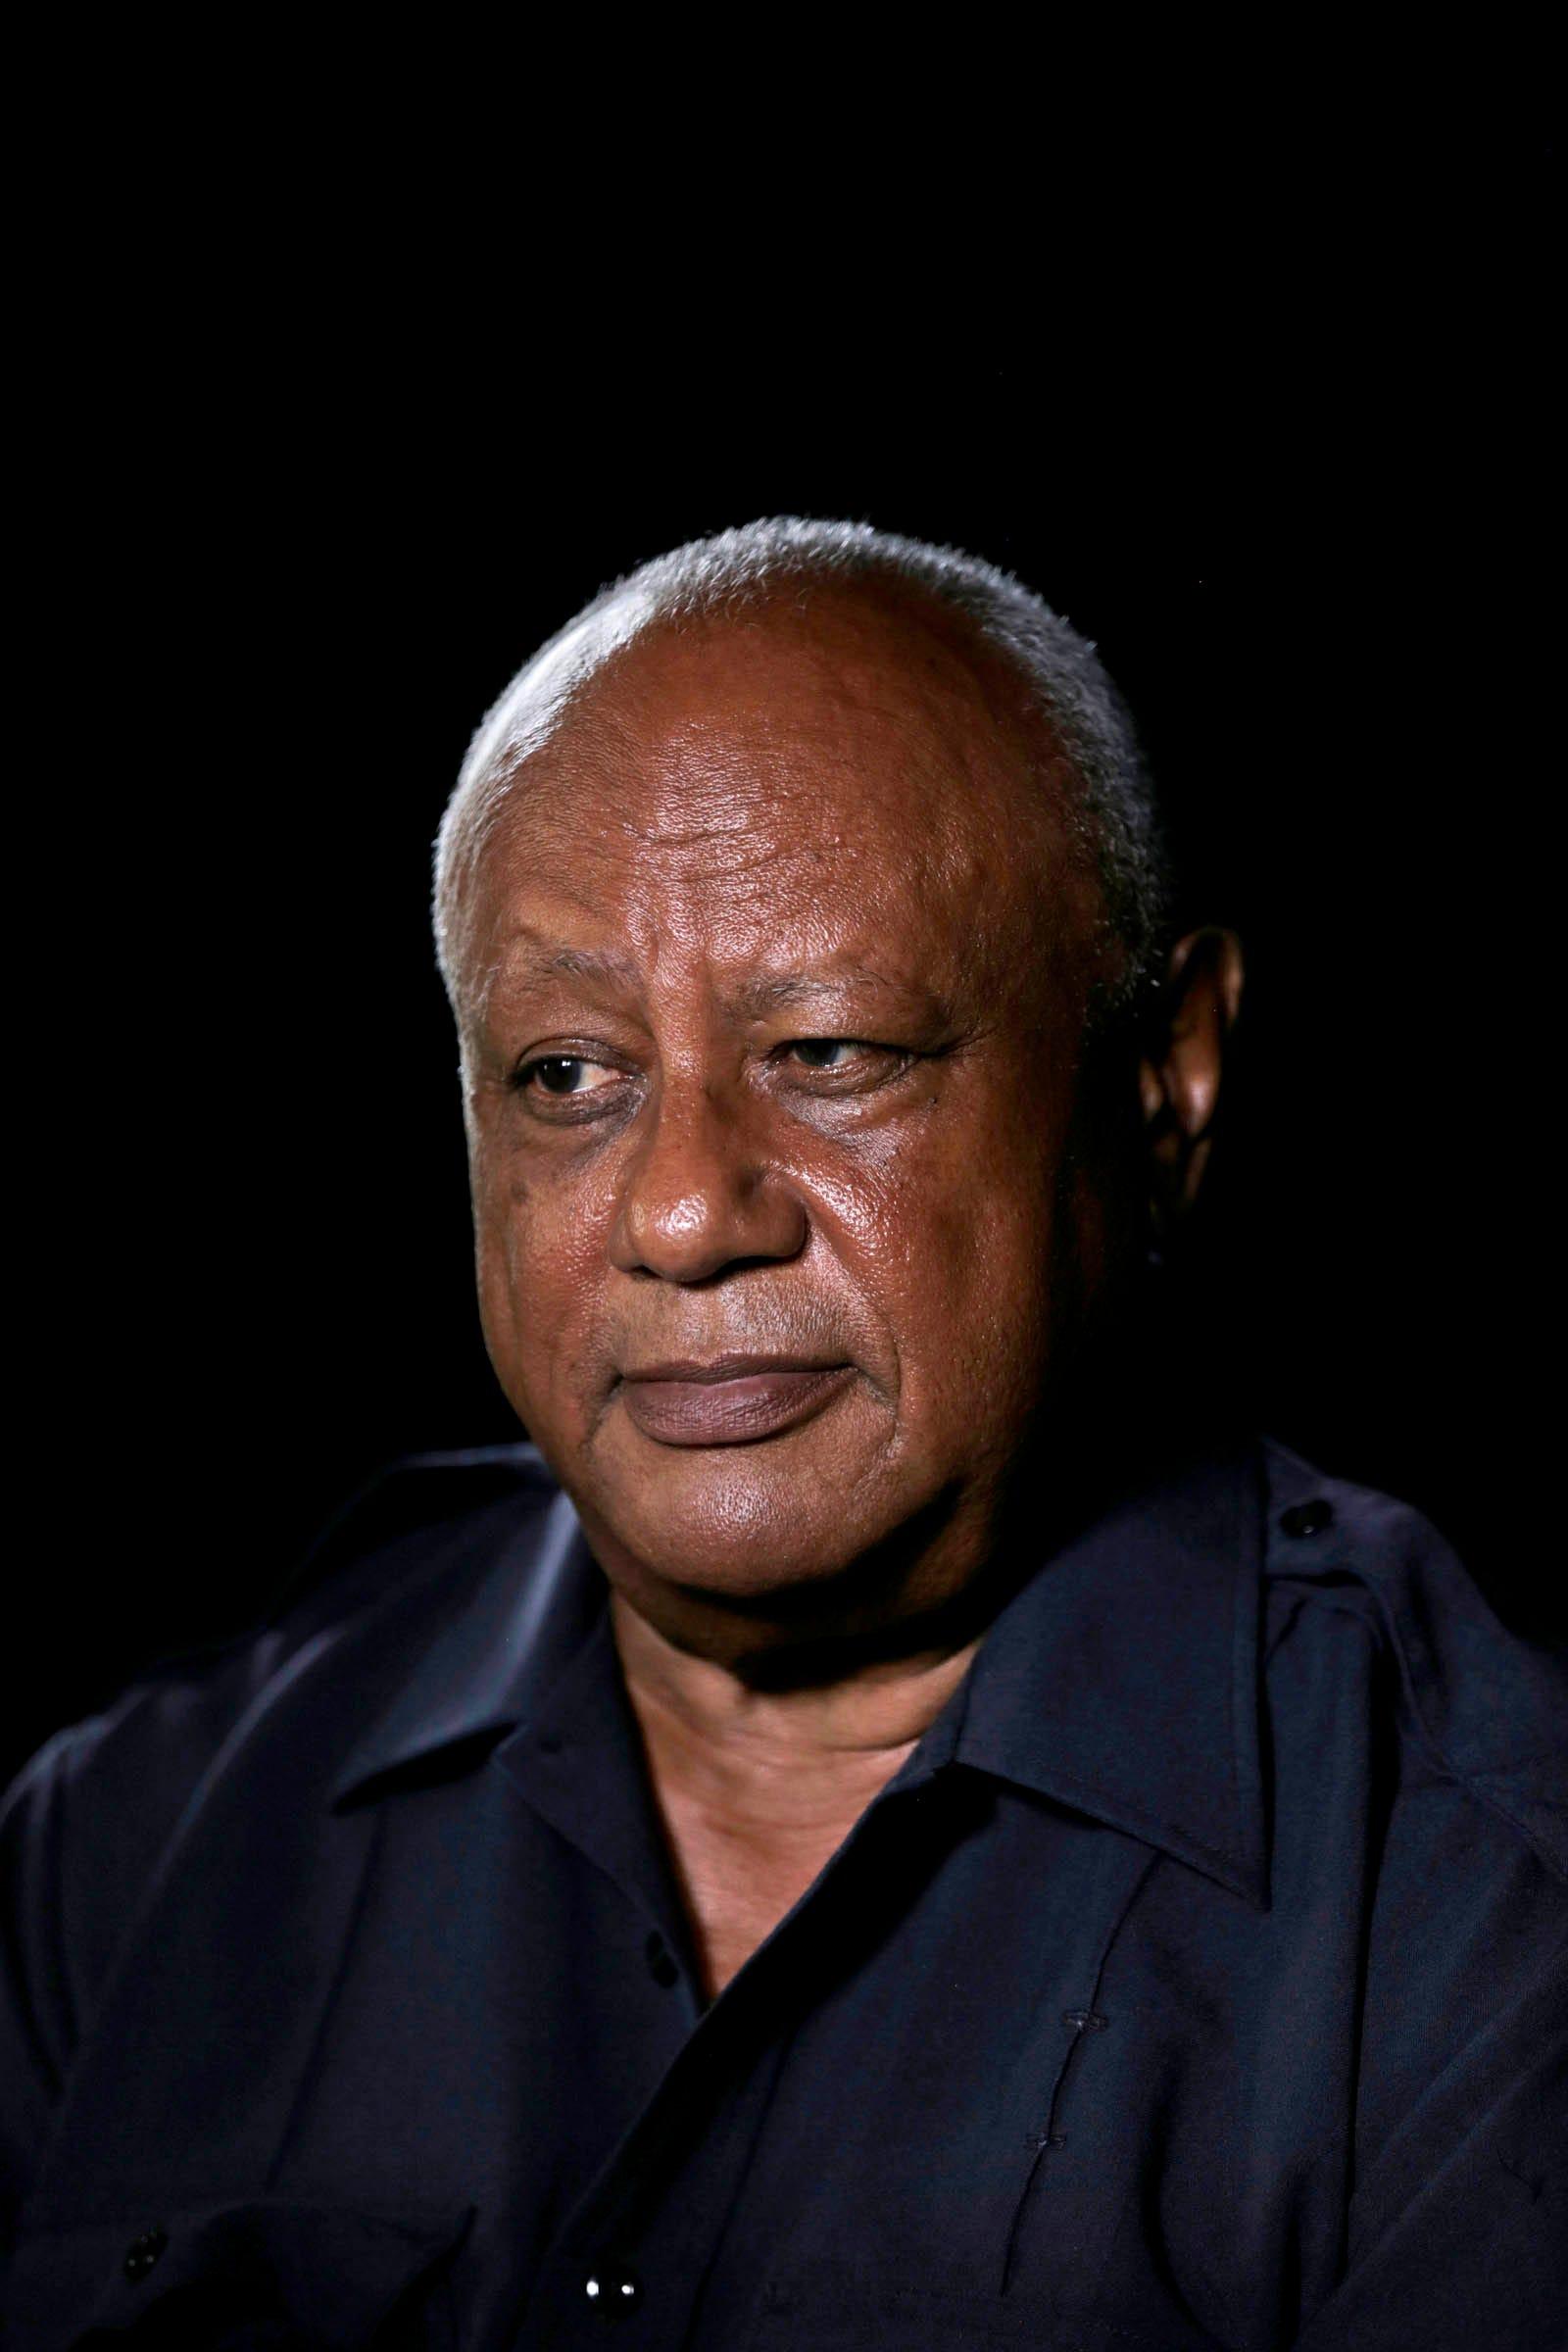 Dan Aldridge helped organize the People's Tribunal after the killings at the Algiers Motel in Detroit in 1967.